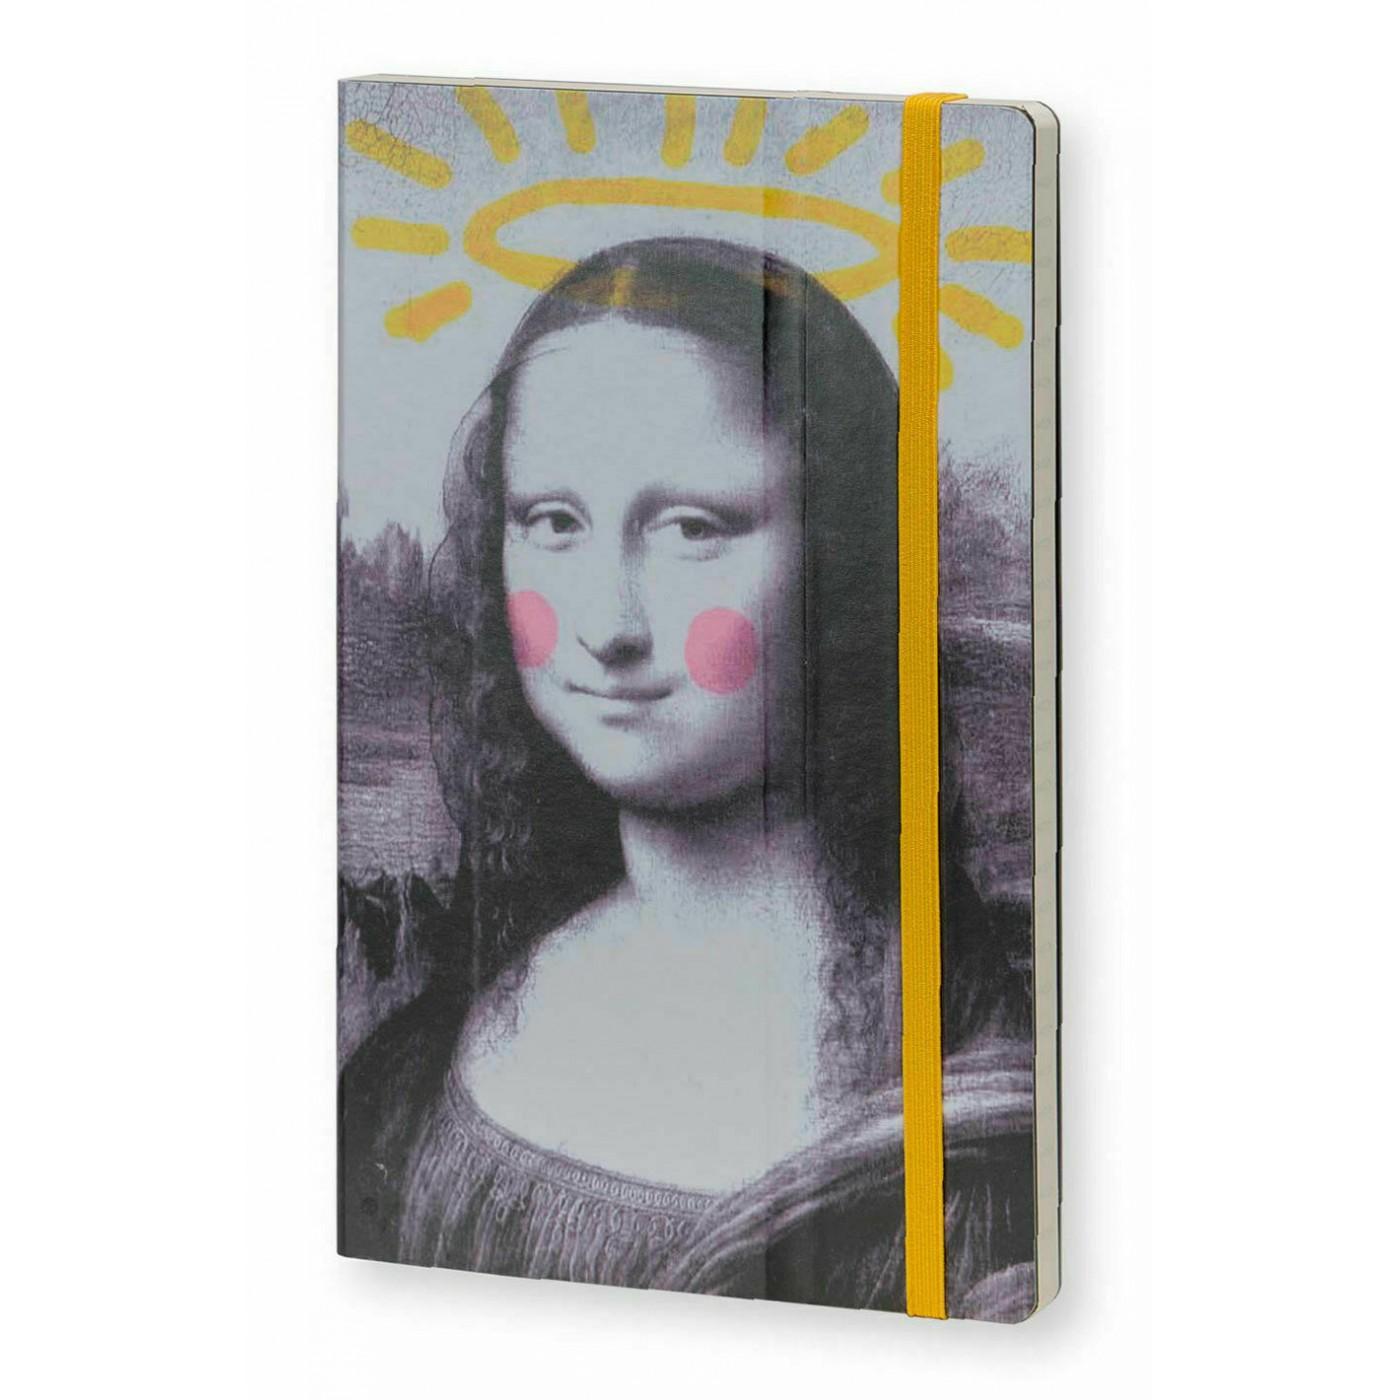 STIFFLEXIBLE taccuino righe, copertina flessibile, 9x14 cm